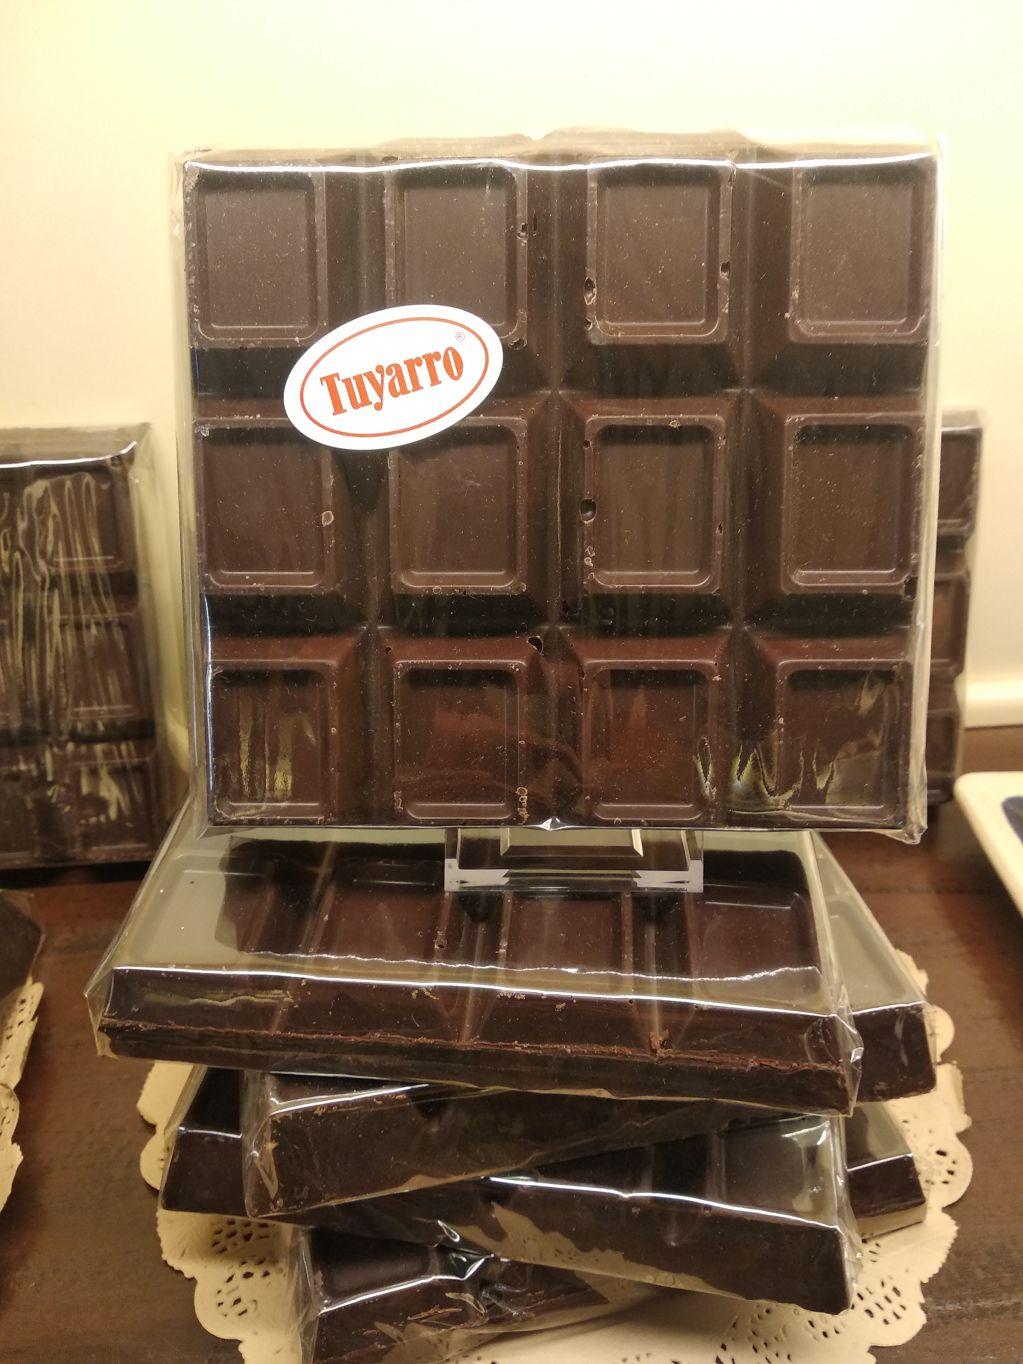 Chocolate cobertura 600 gr - ee5f5-IMG_20200901_100354.jpg